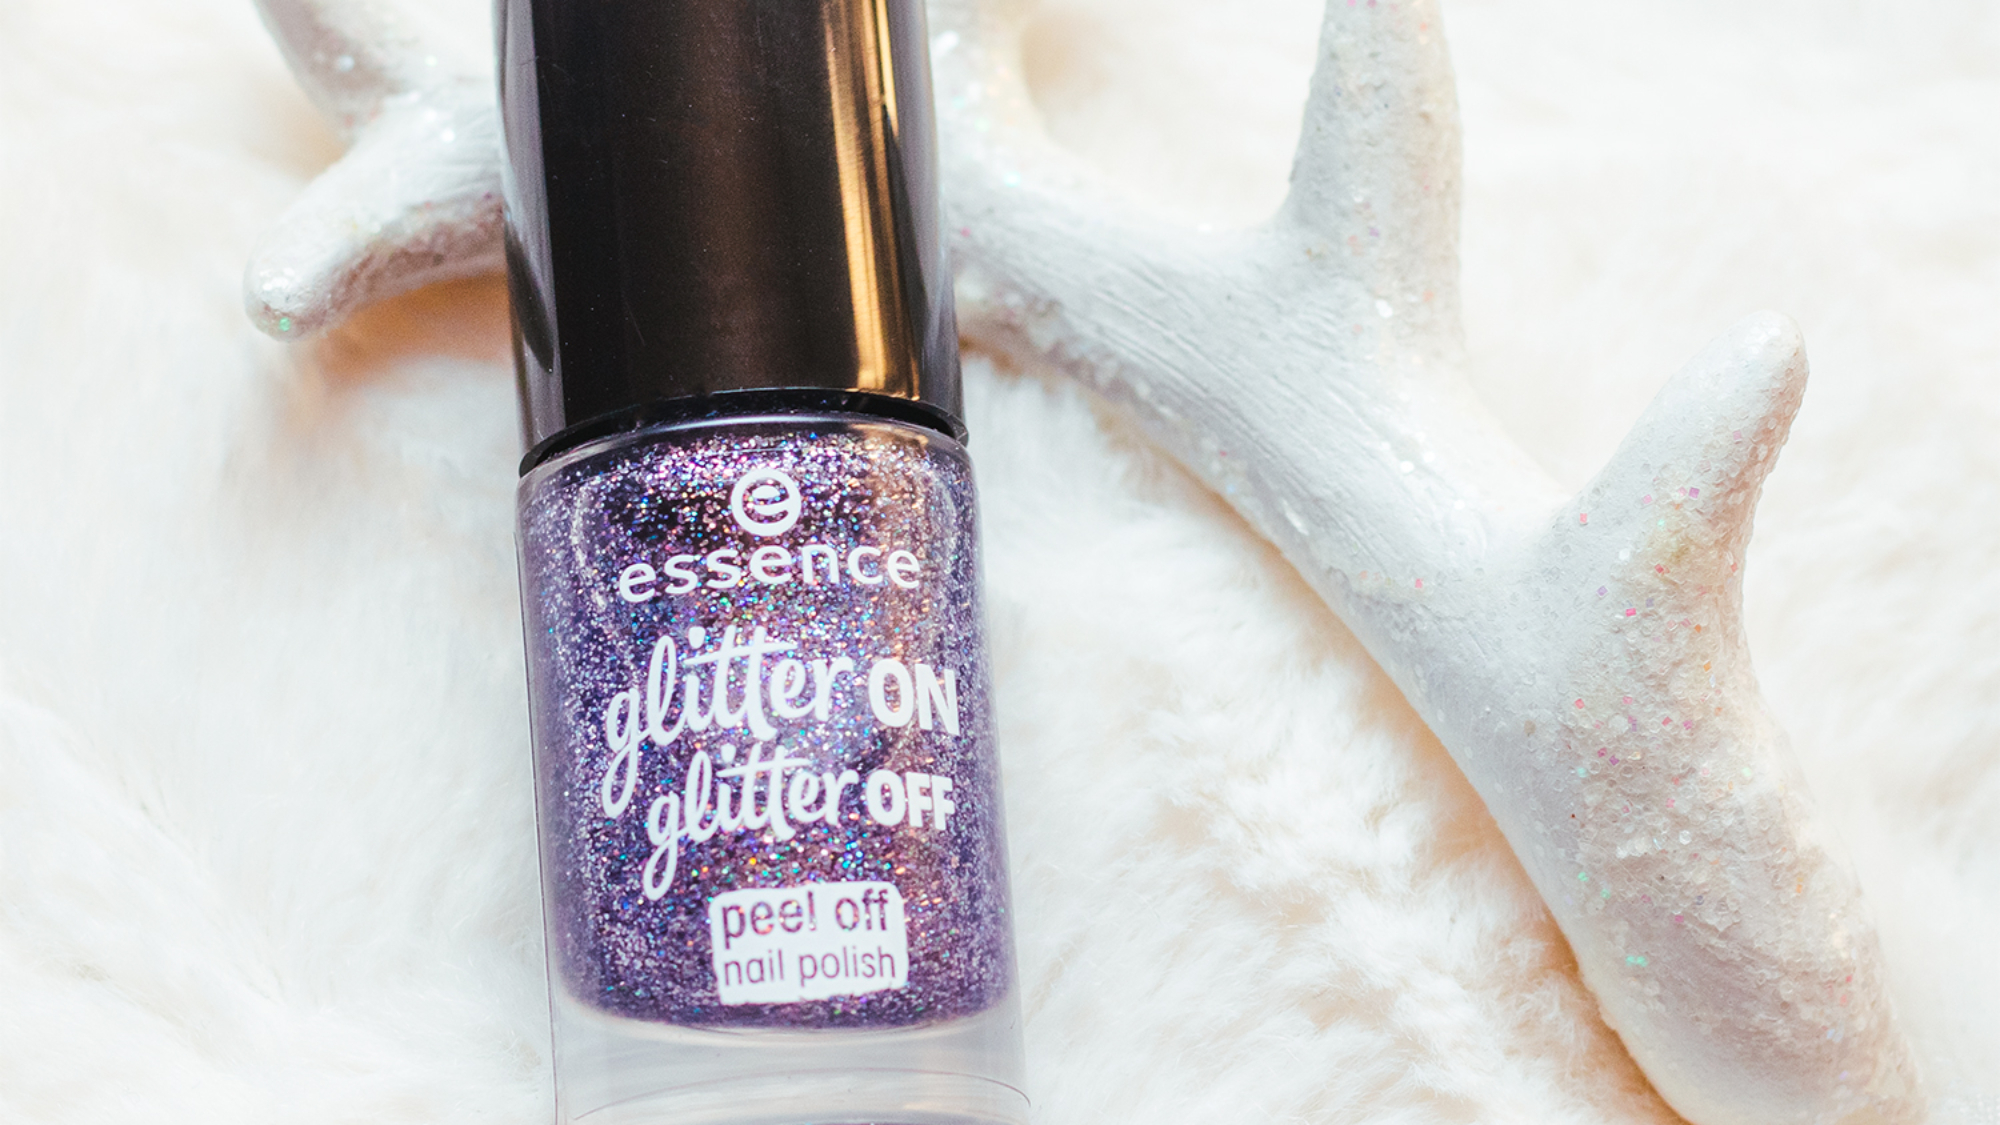 essence Glitter On Glitter Off